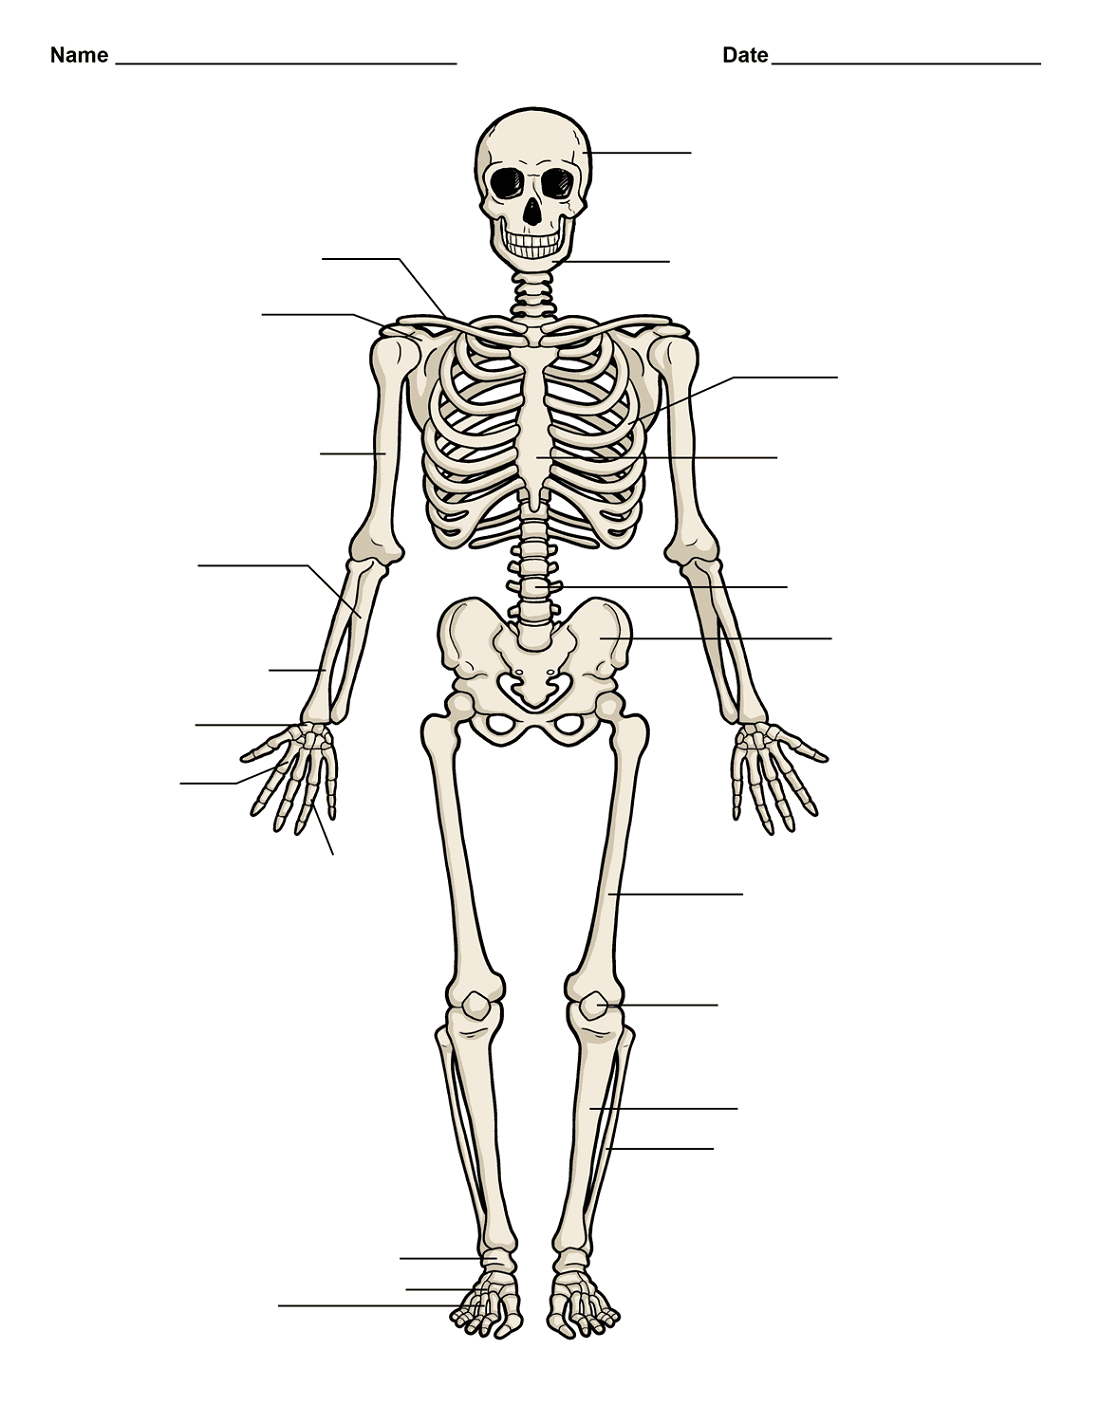 Body Organs Diagram Human Diagrams Body Skull And Organs Printable Diagram